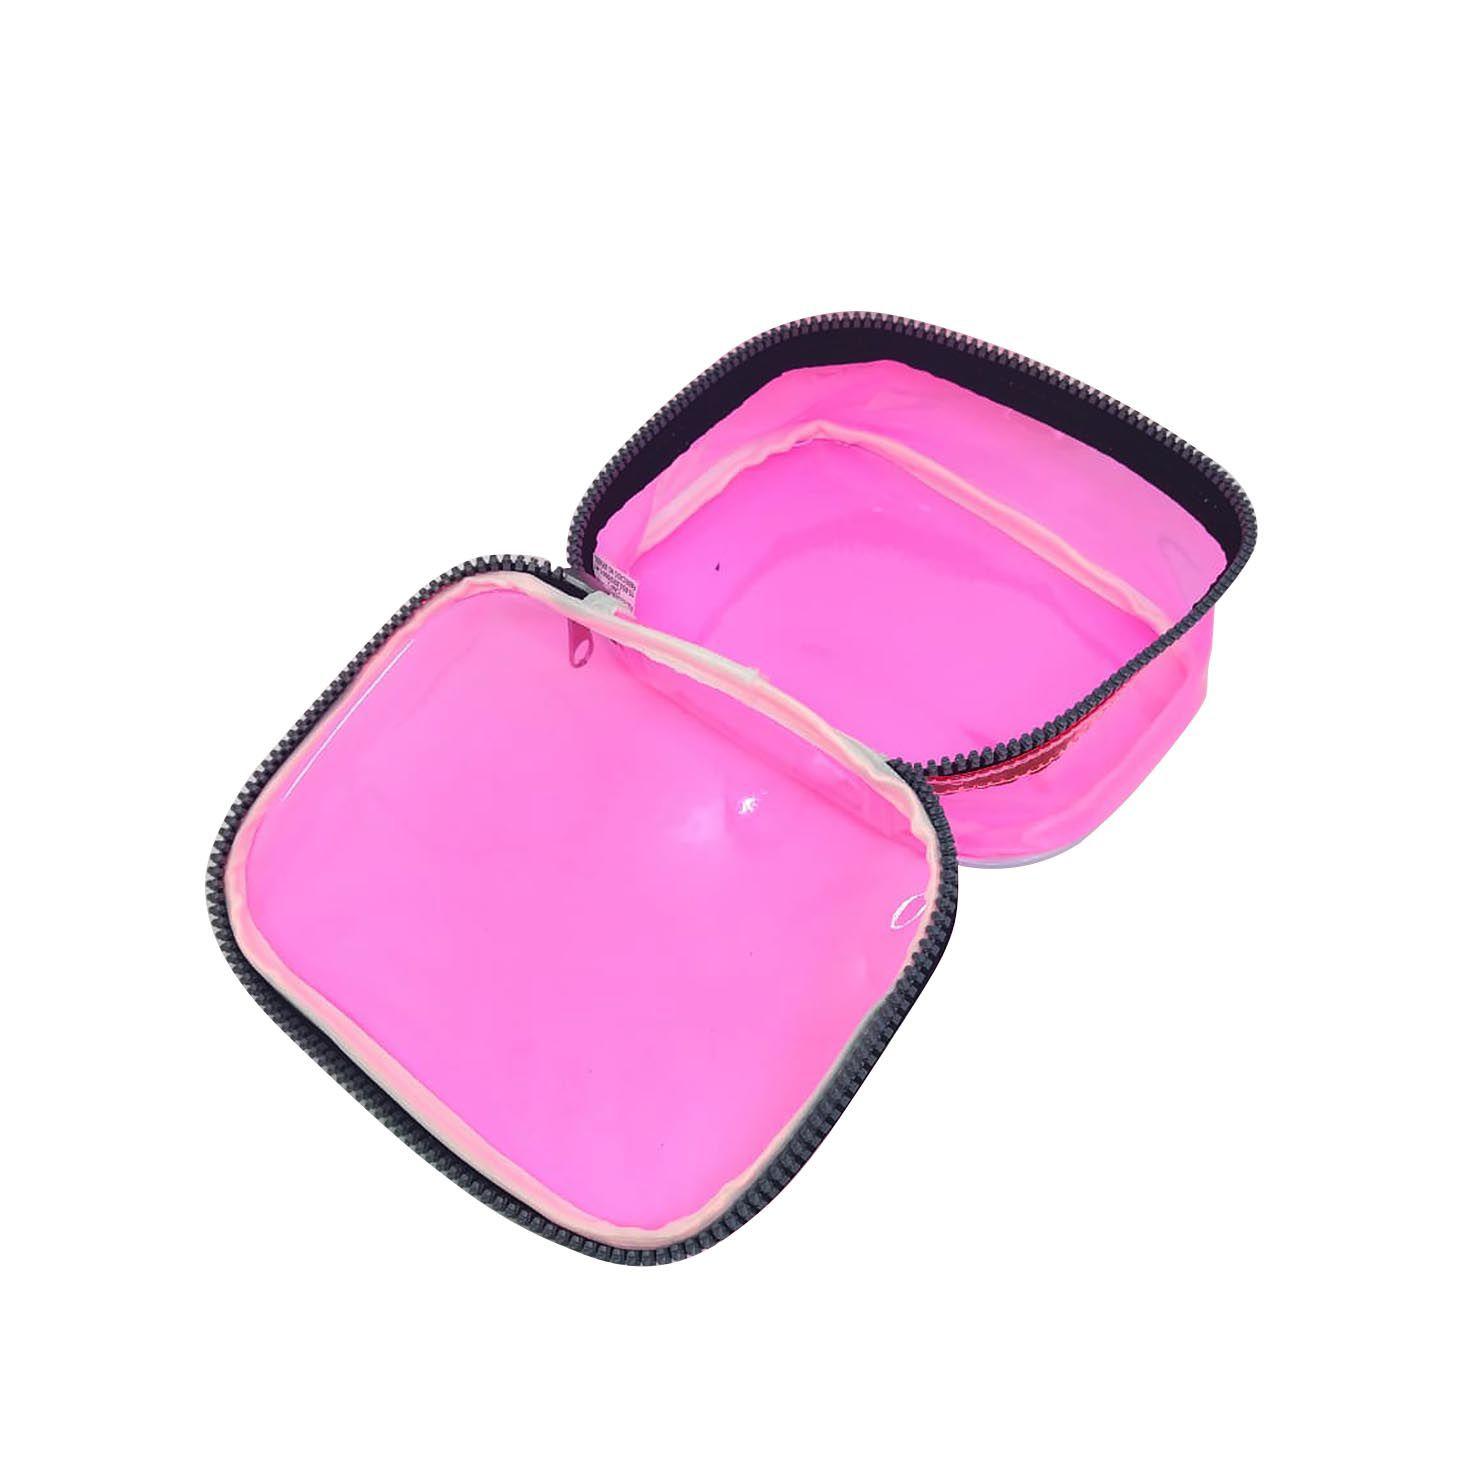 Estojo escolar box rosa neon transparente Fizz